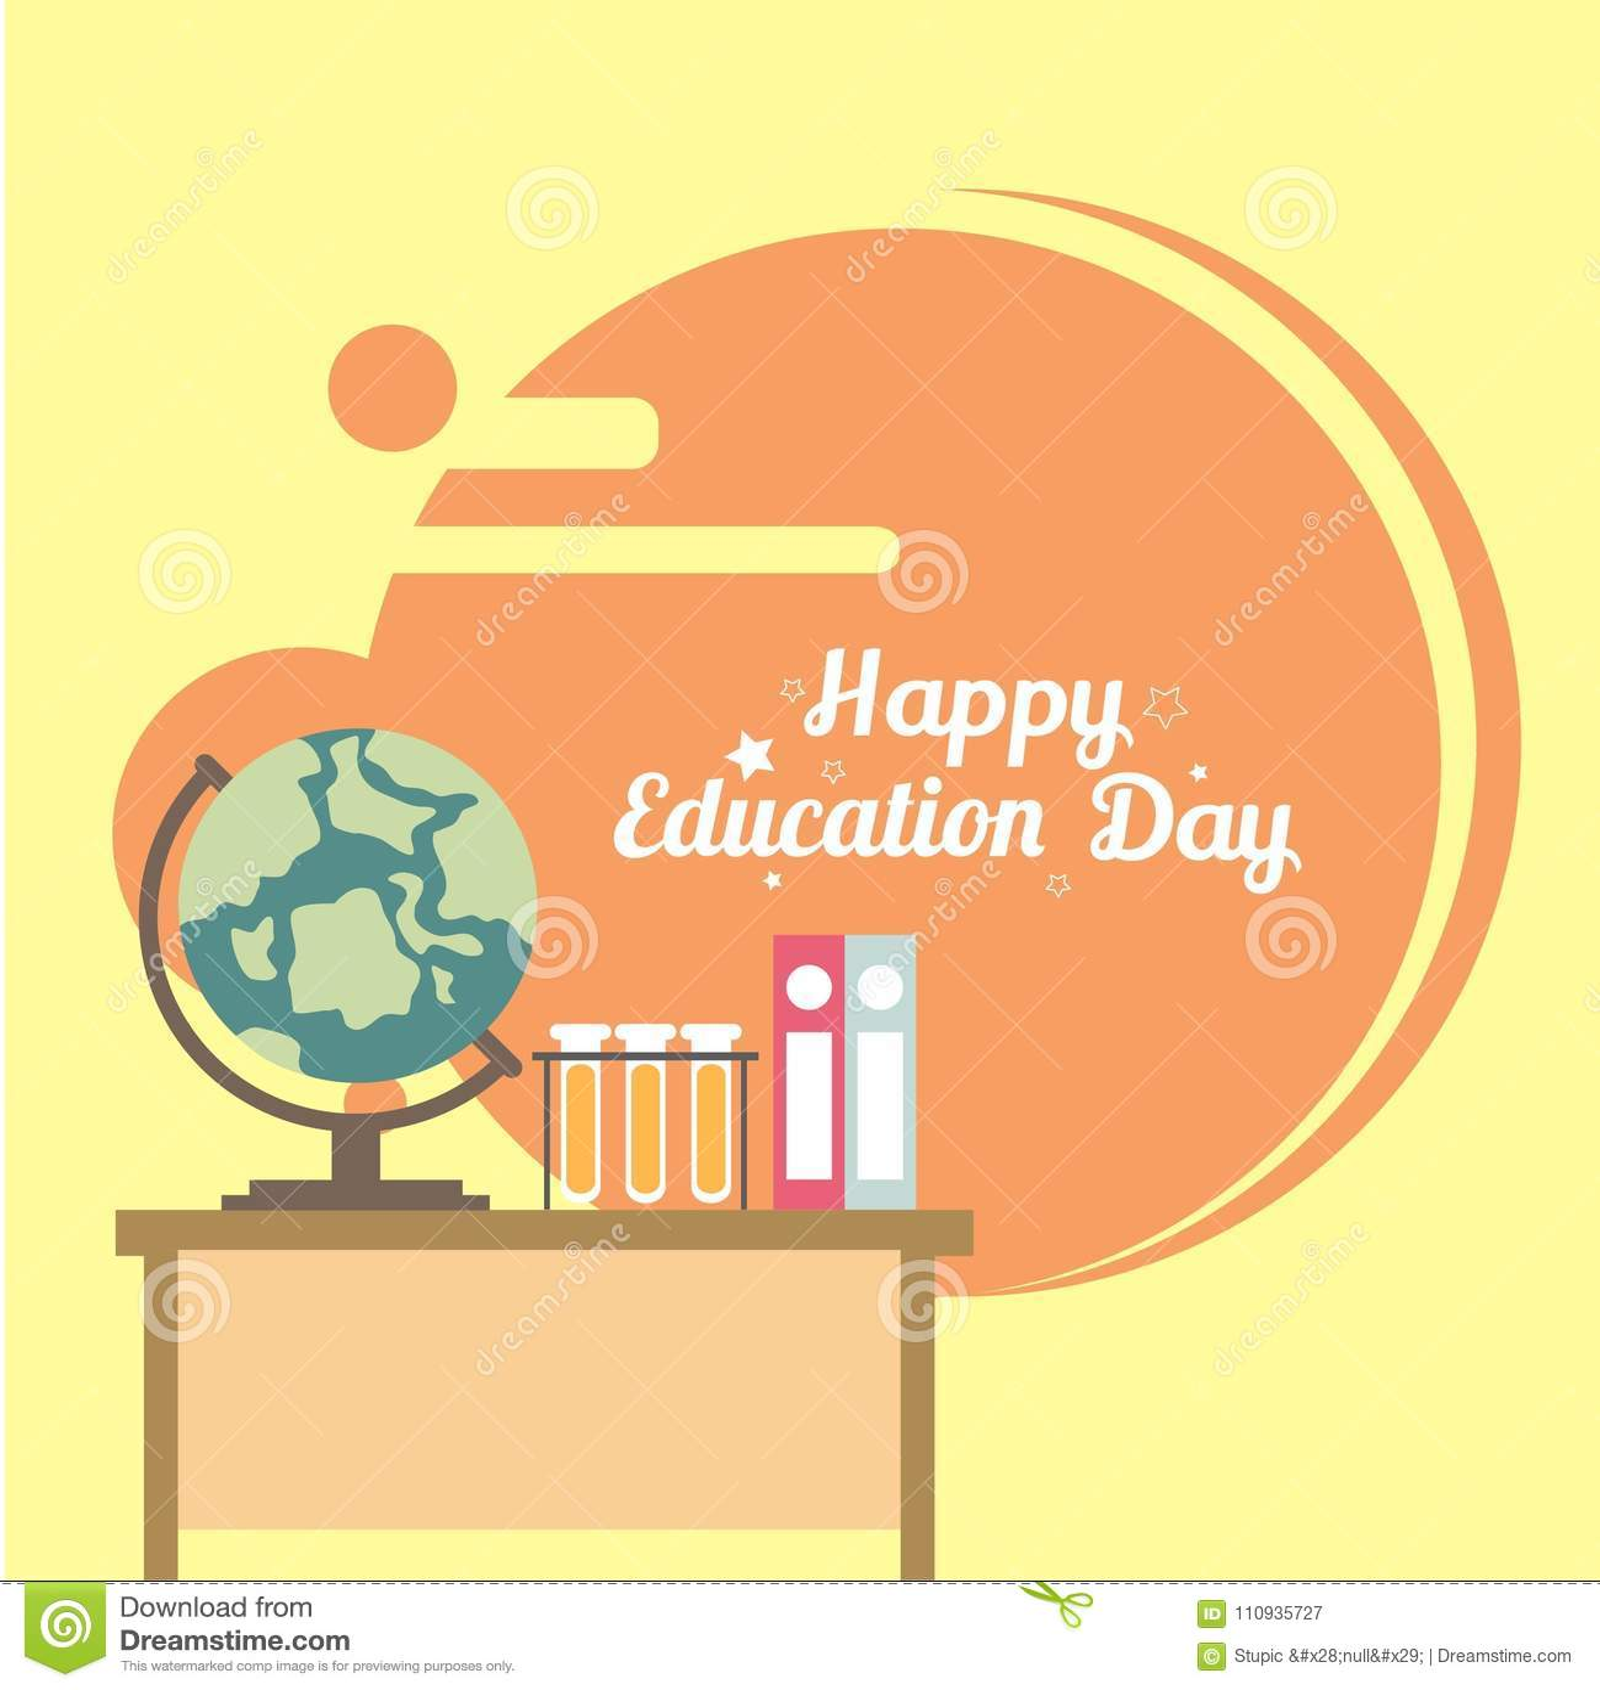 creative education day illustration design vector art logo